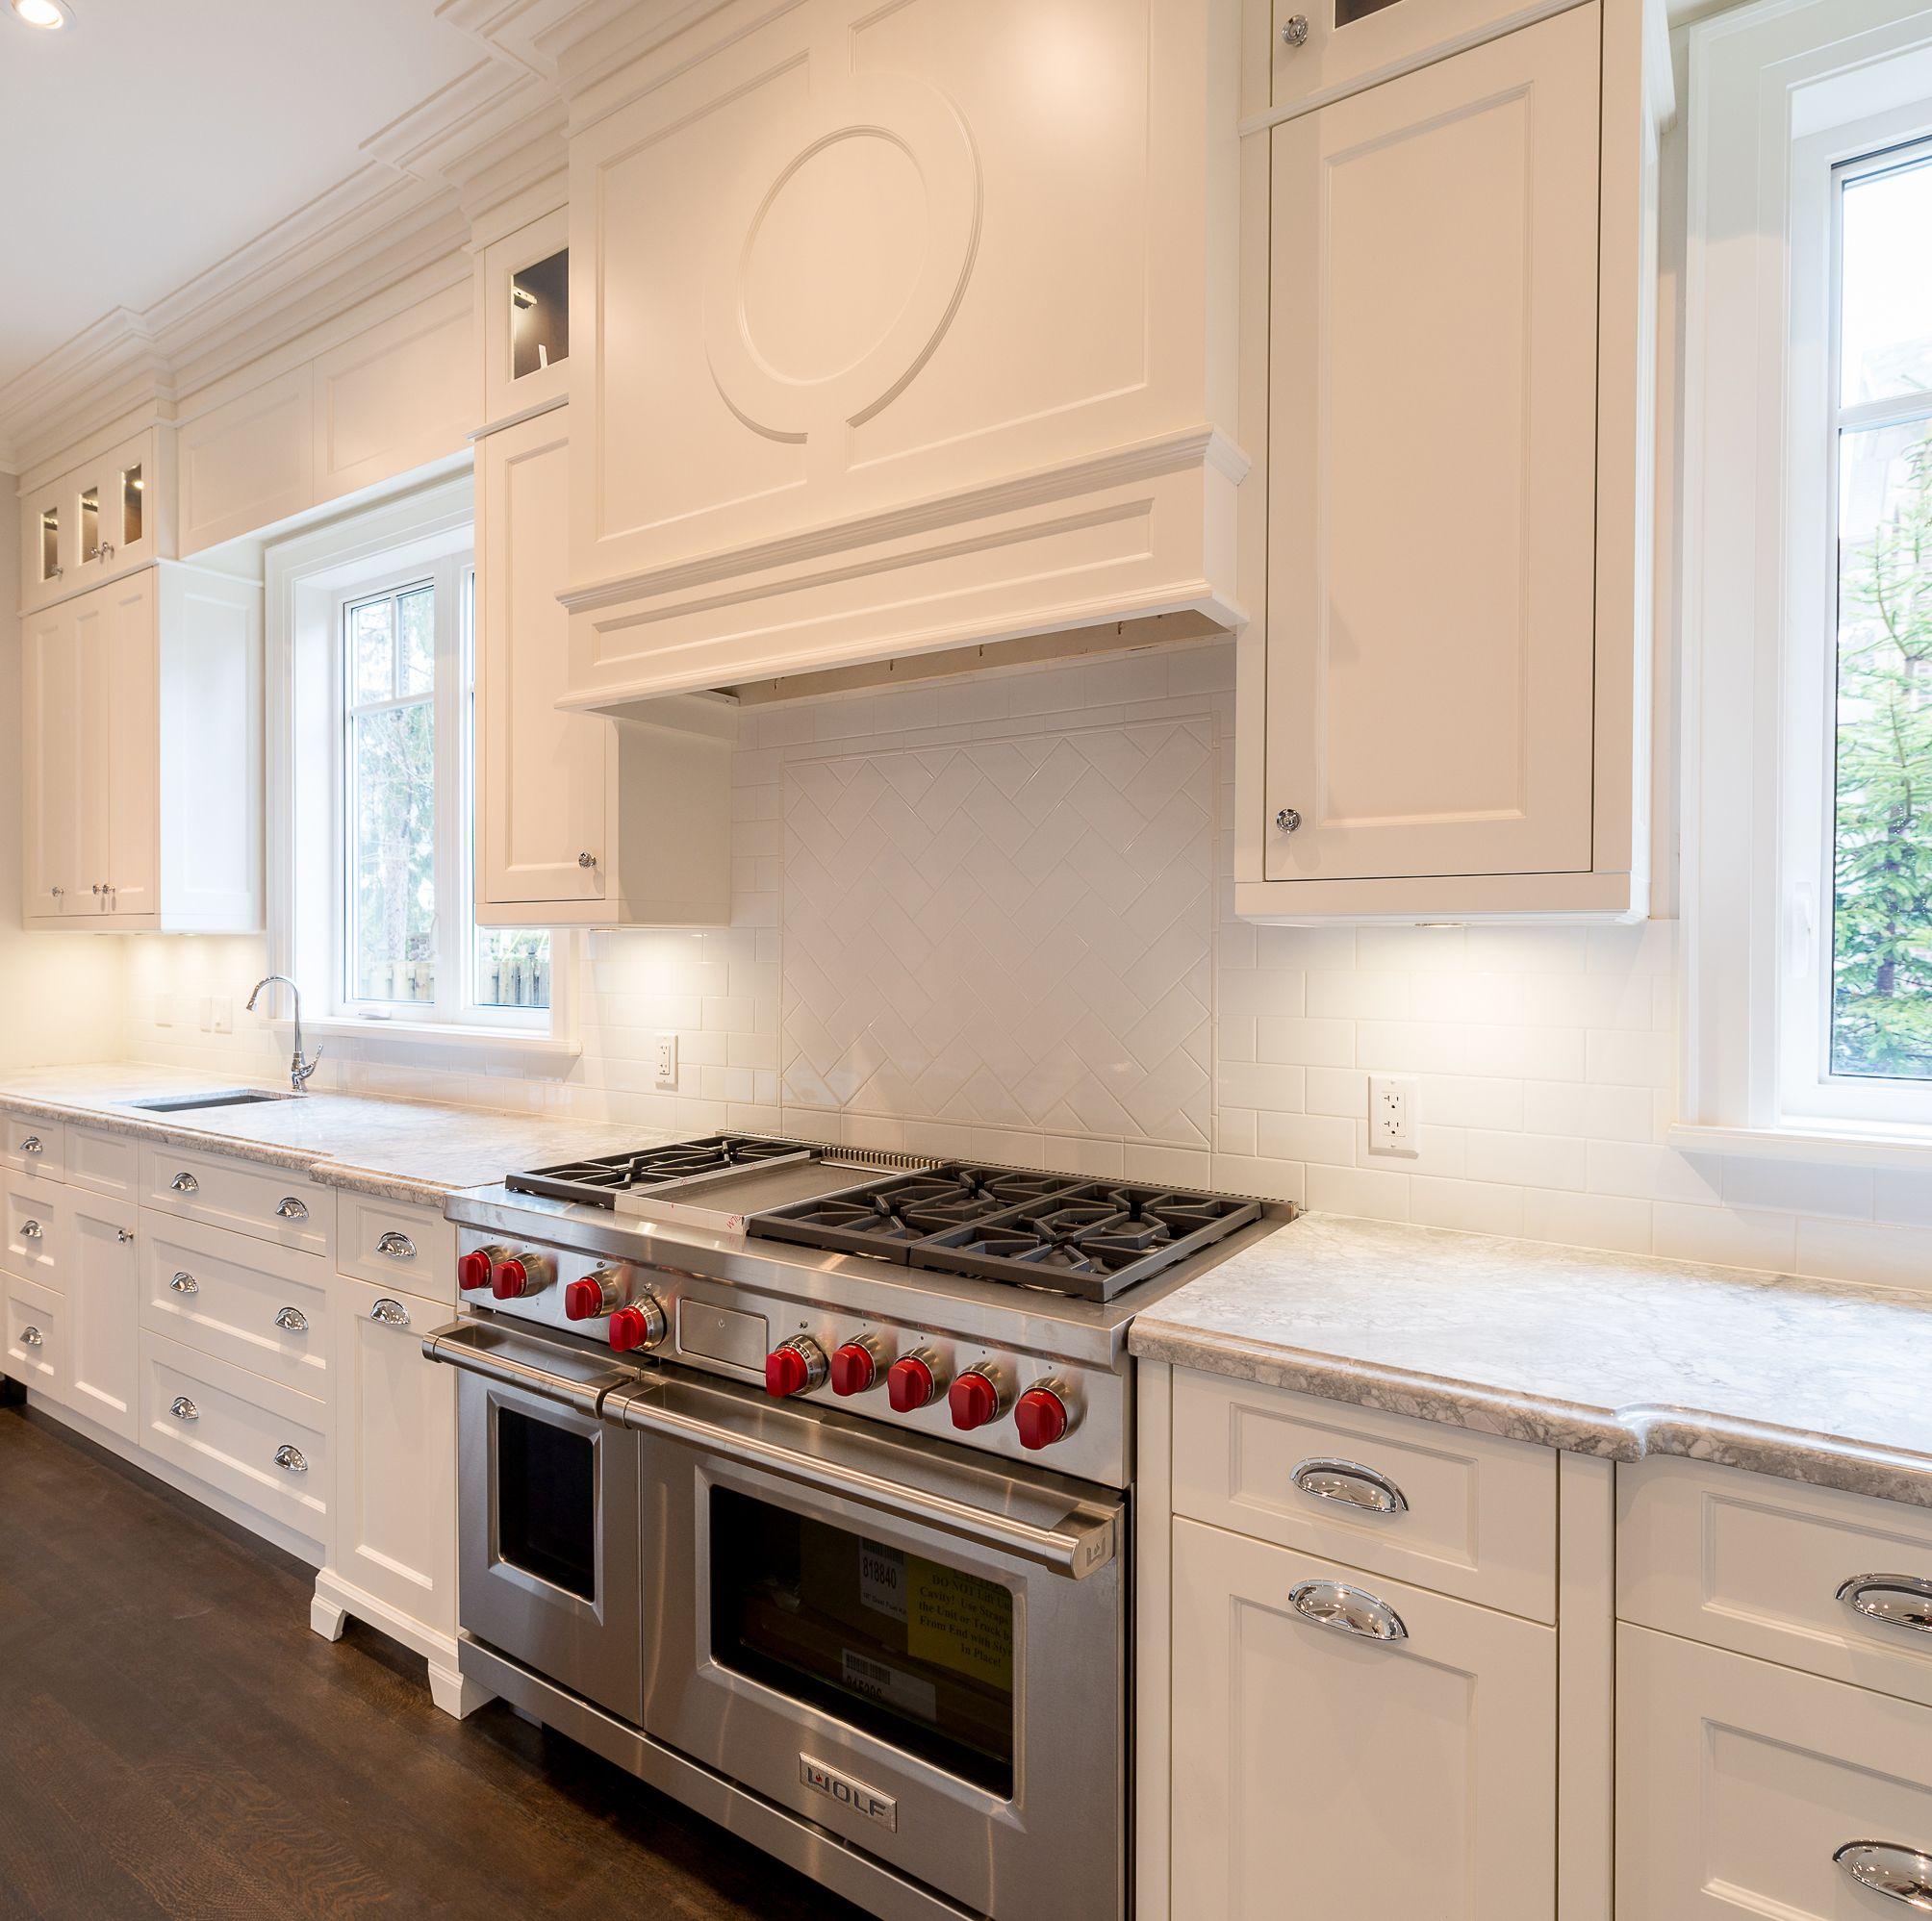 White Kitchen Ideas Super White Granite Cc40 Cloud White Cabinetry Decorative Hood Wolf Range Kitchen Cabinet Design White Kitchen Design White Kitchen